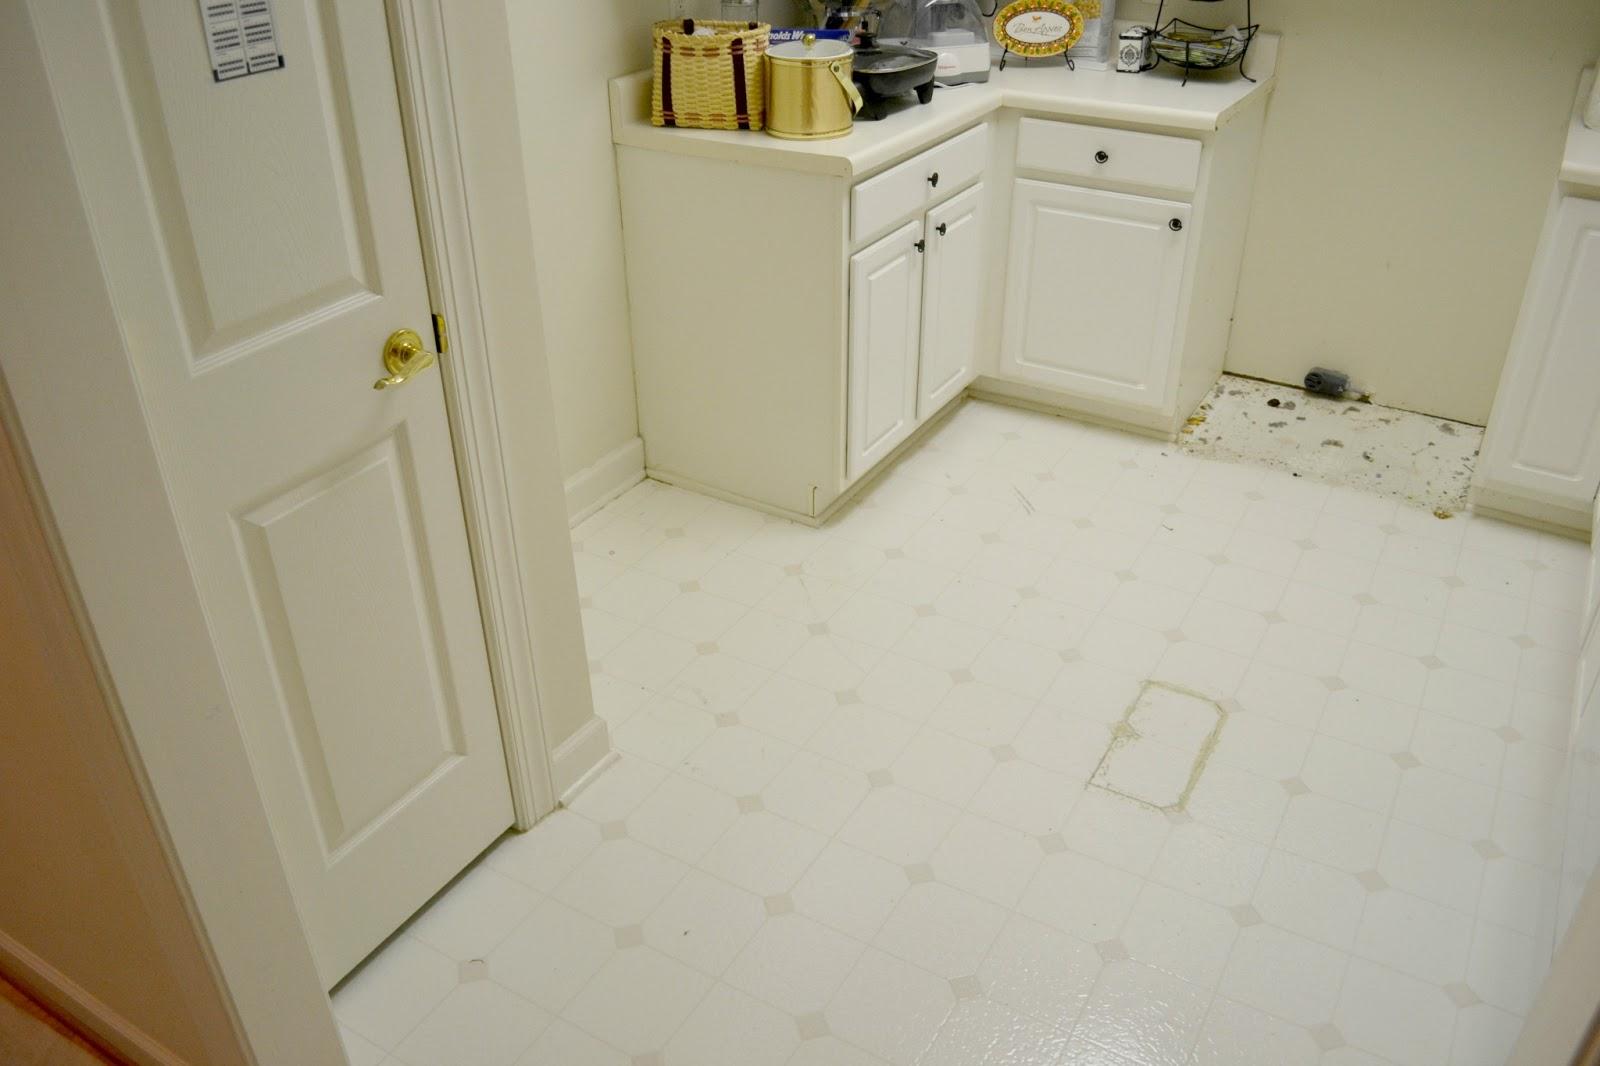 Decor You Adore Kitchen Botox Crisp Clean Ceramic Tile